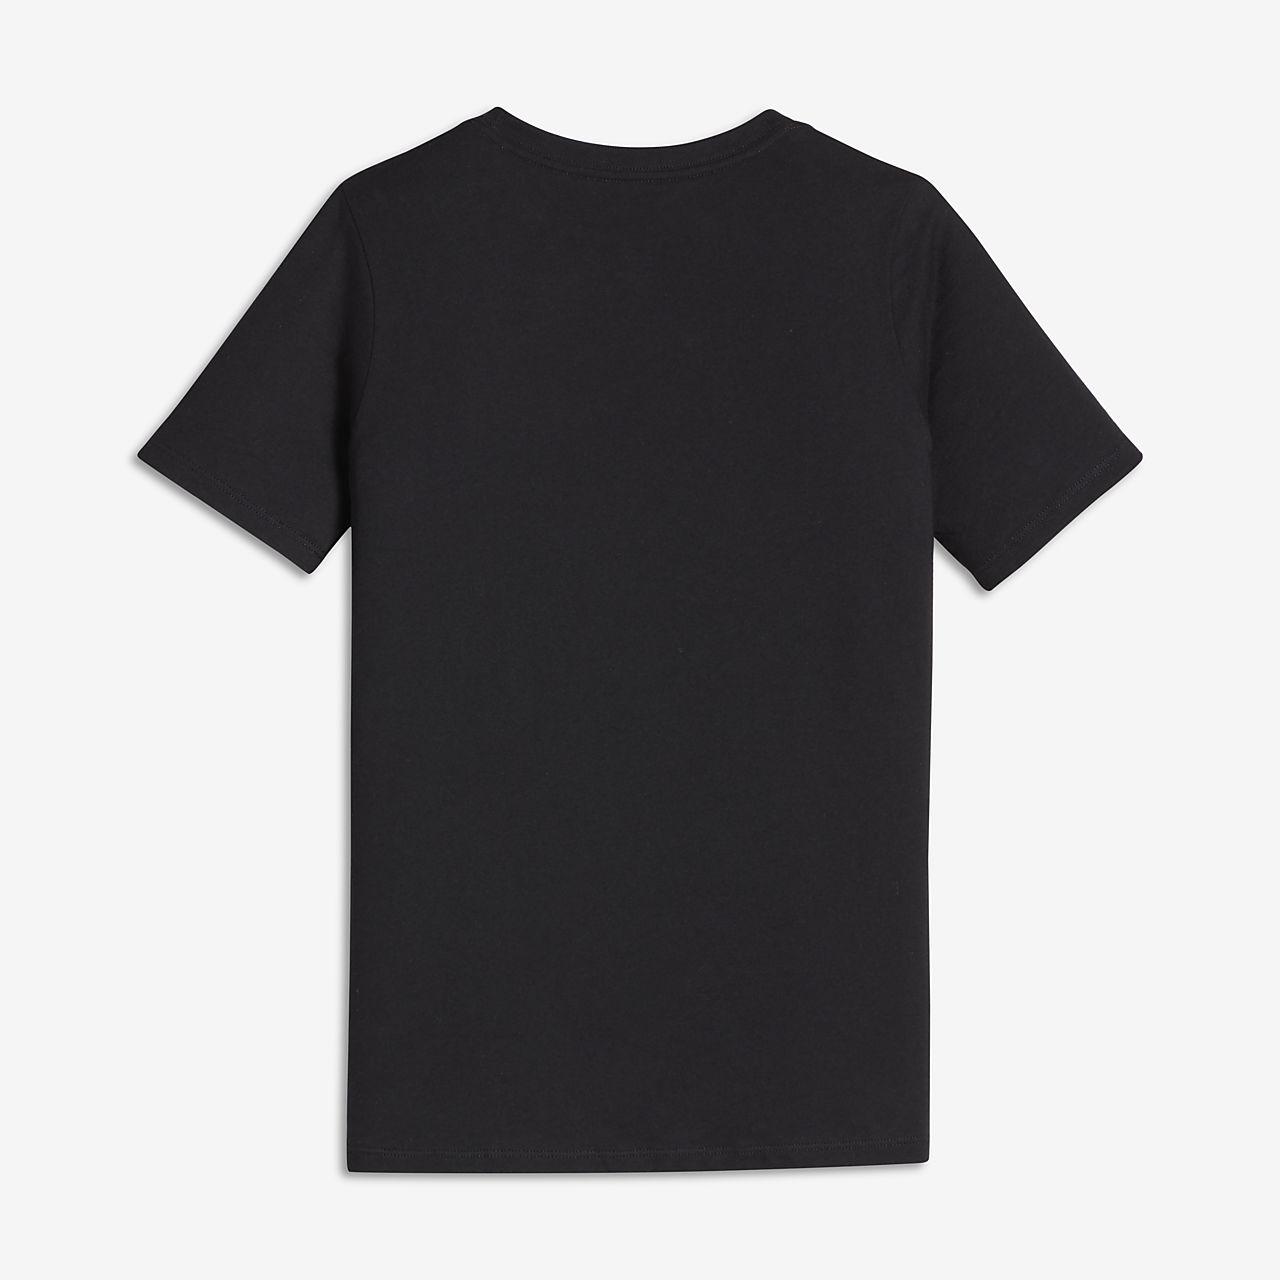 Nike Dry Big Kids' Running Tops Black/White